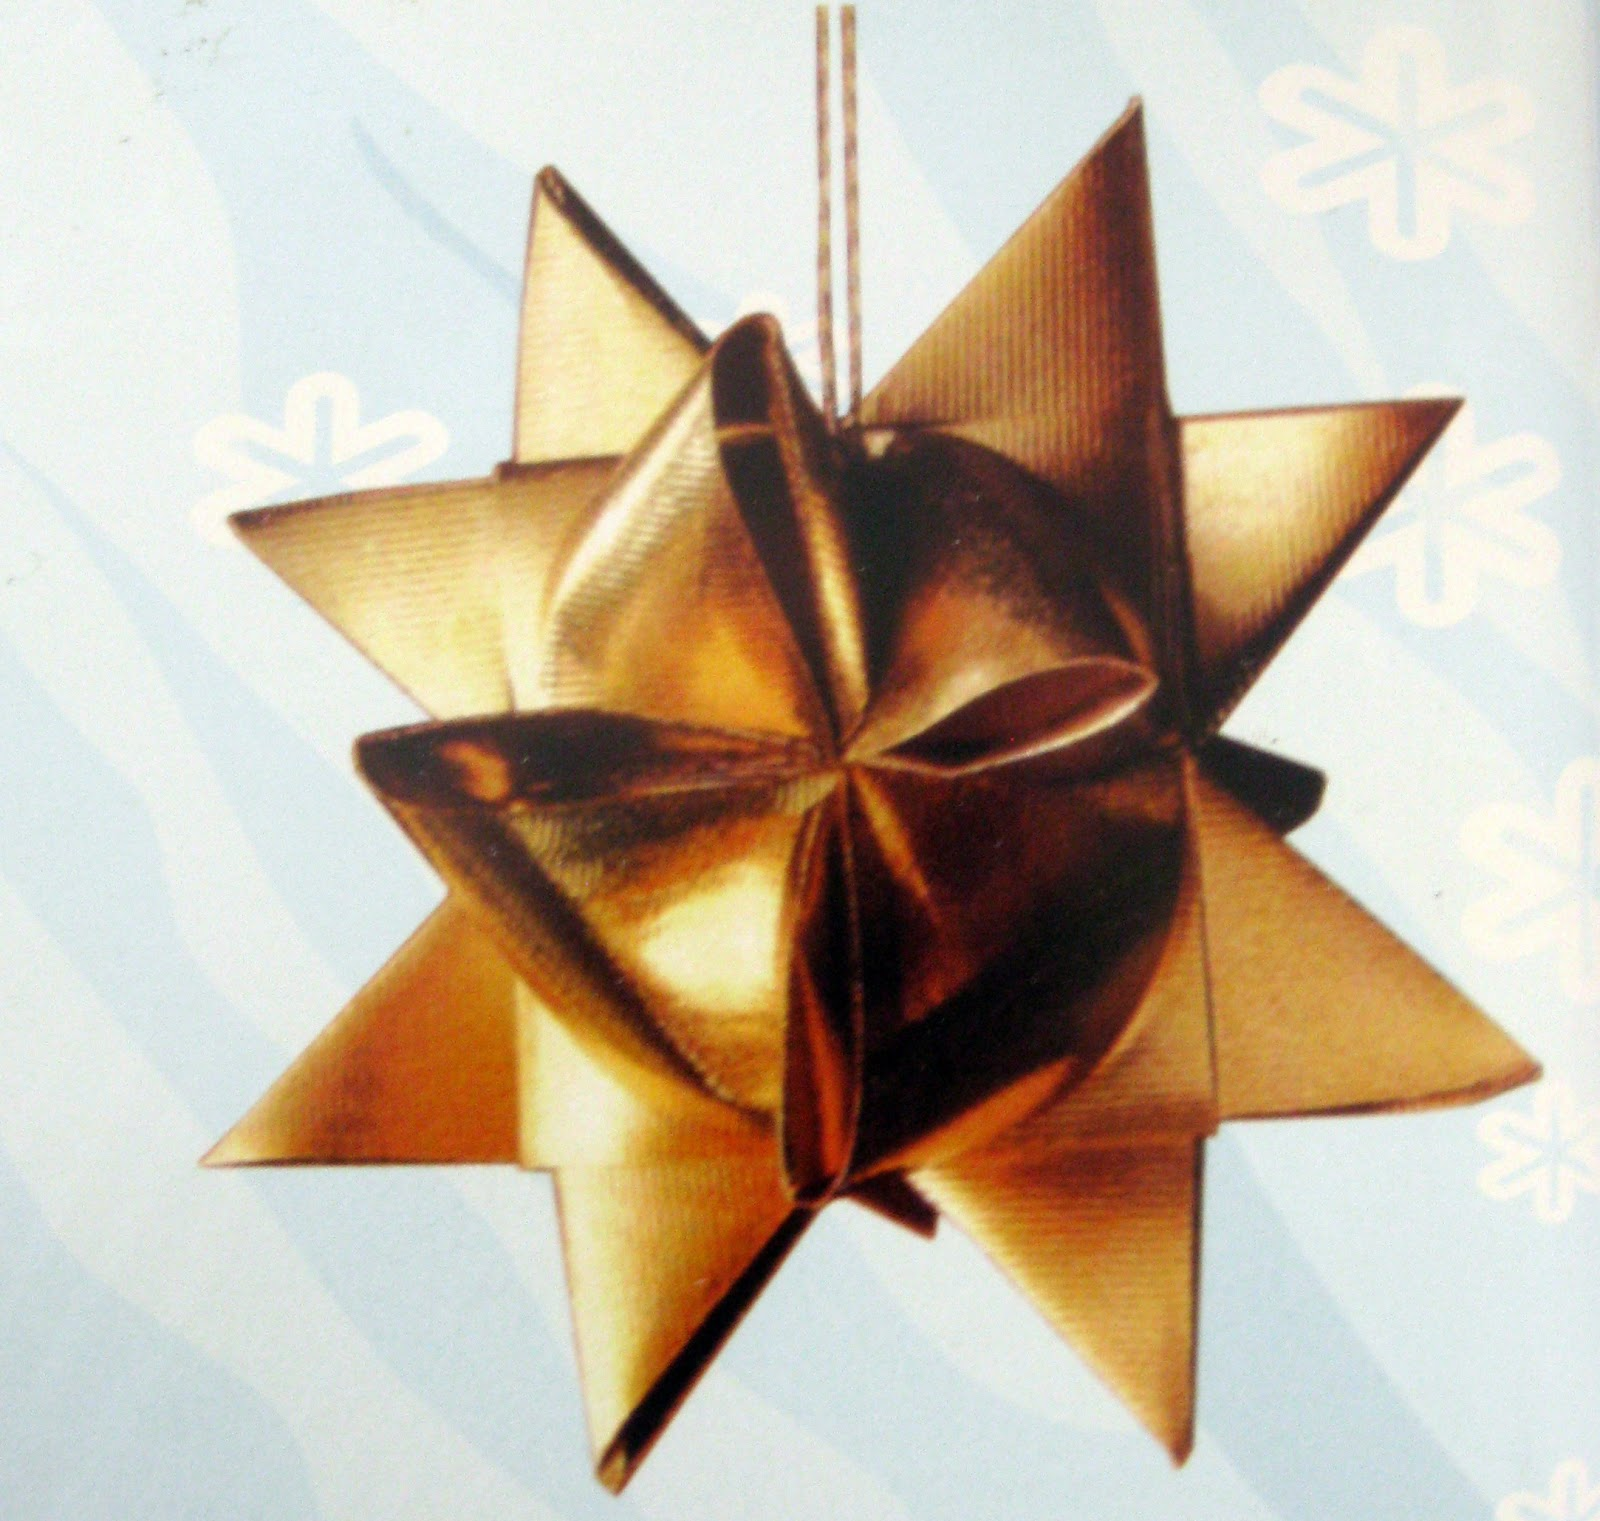 Estrella navide a de tela y papel - Manualidades navidenas paso a paso ...